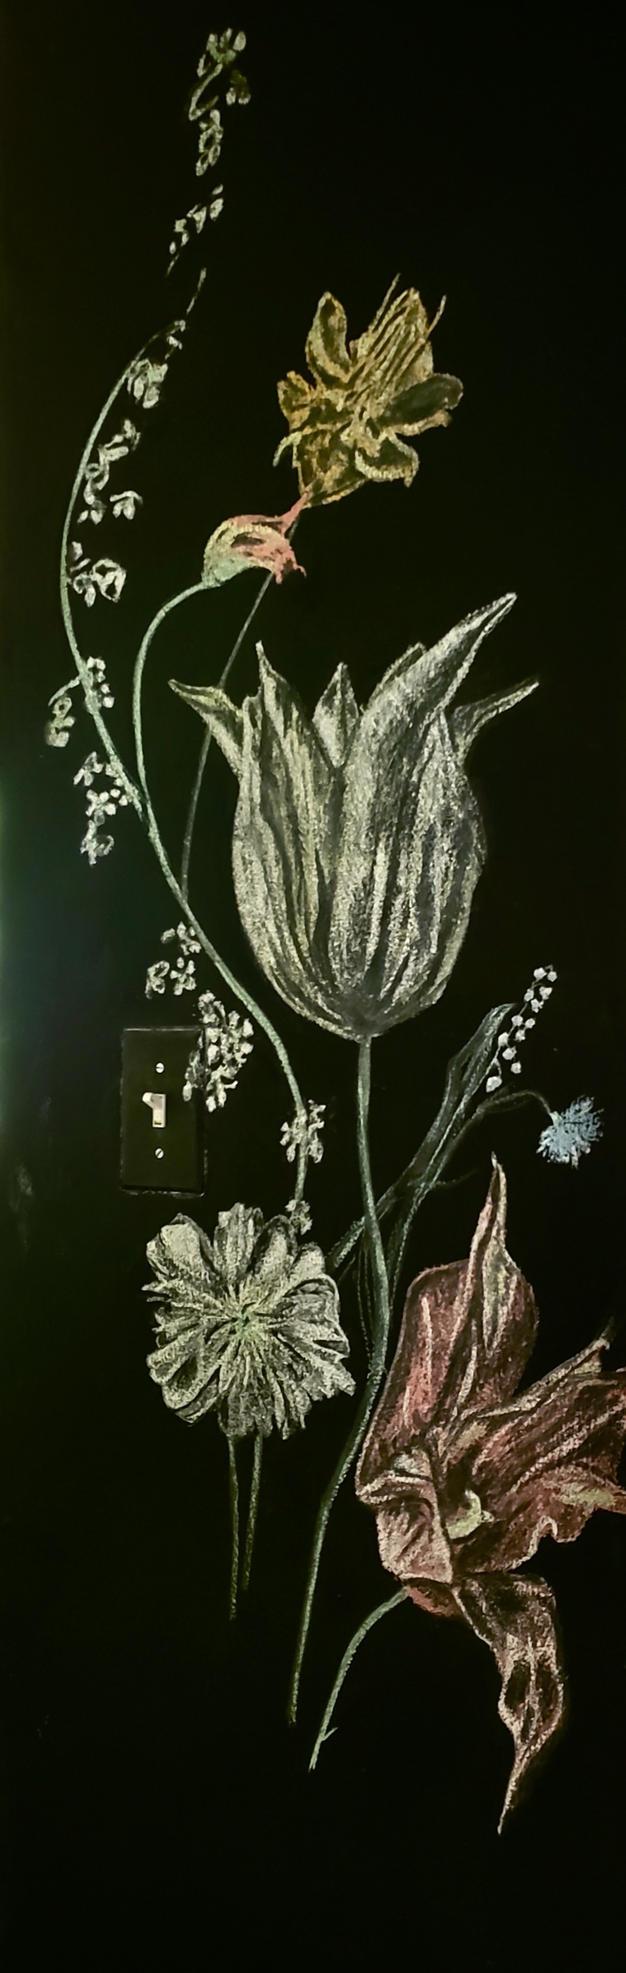 Light Switch by Roxane Hayward